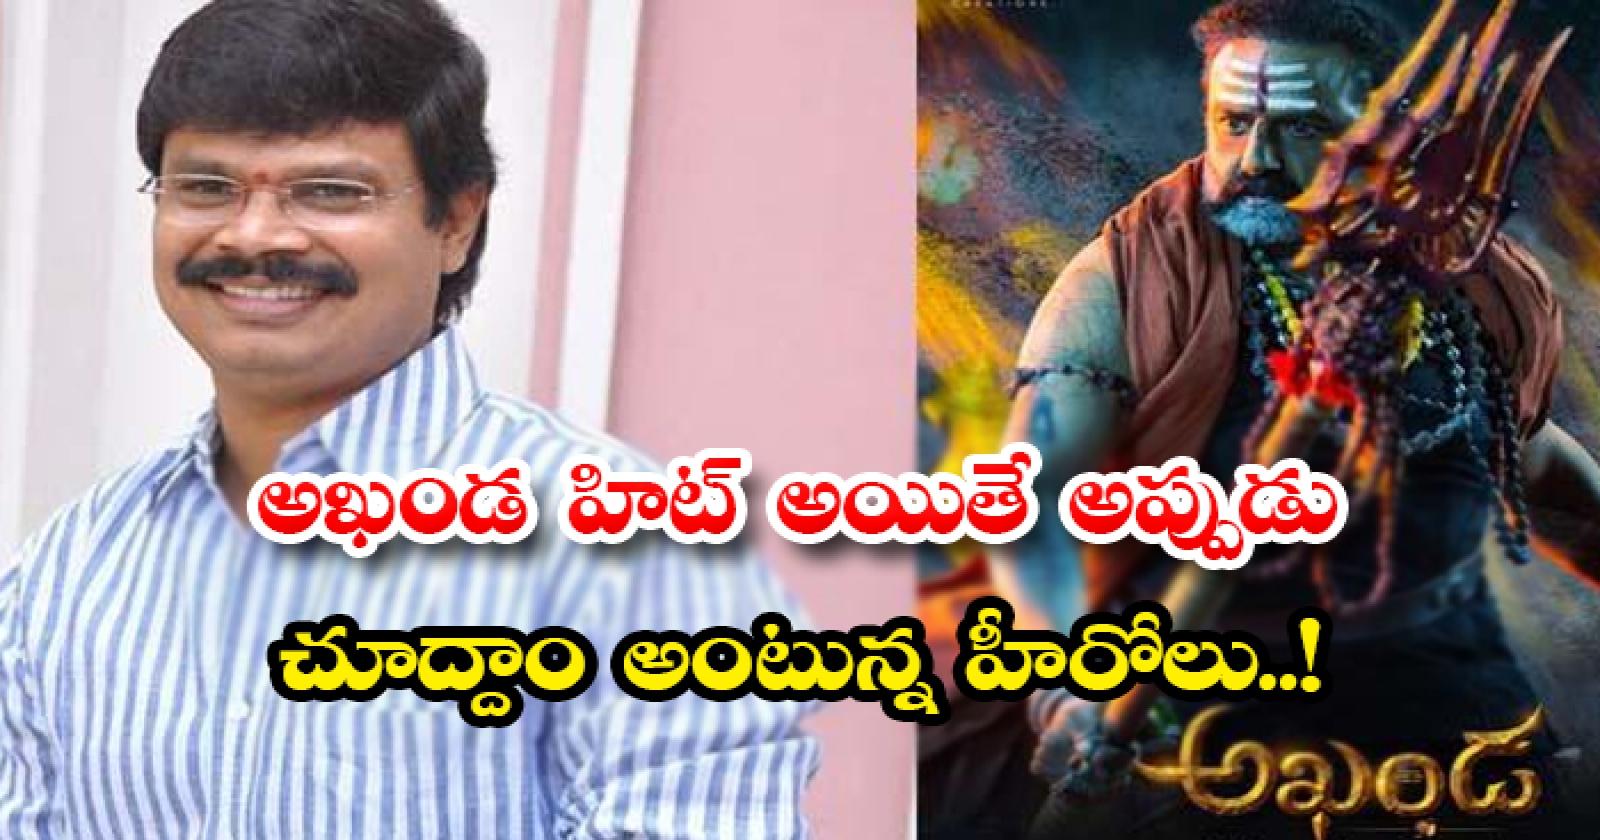 Boyapati Srinu Next Movie Update-అఖండ హిట్ అయితే అప్పుడు చూద్దాం అంటున్న హీరోలు..-Latest News - Telugu-Telugu Tollywood Photo Image-TeluguStop.com